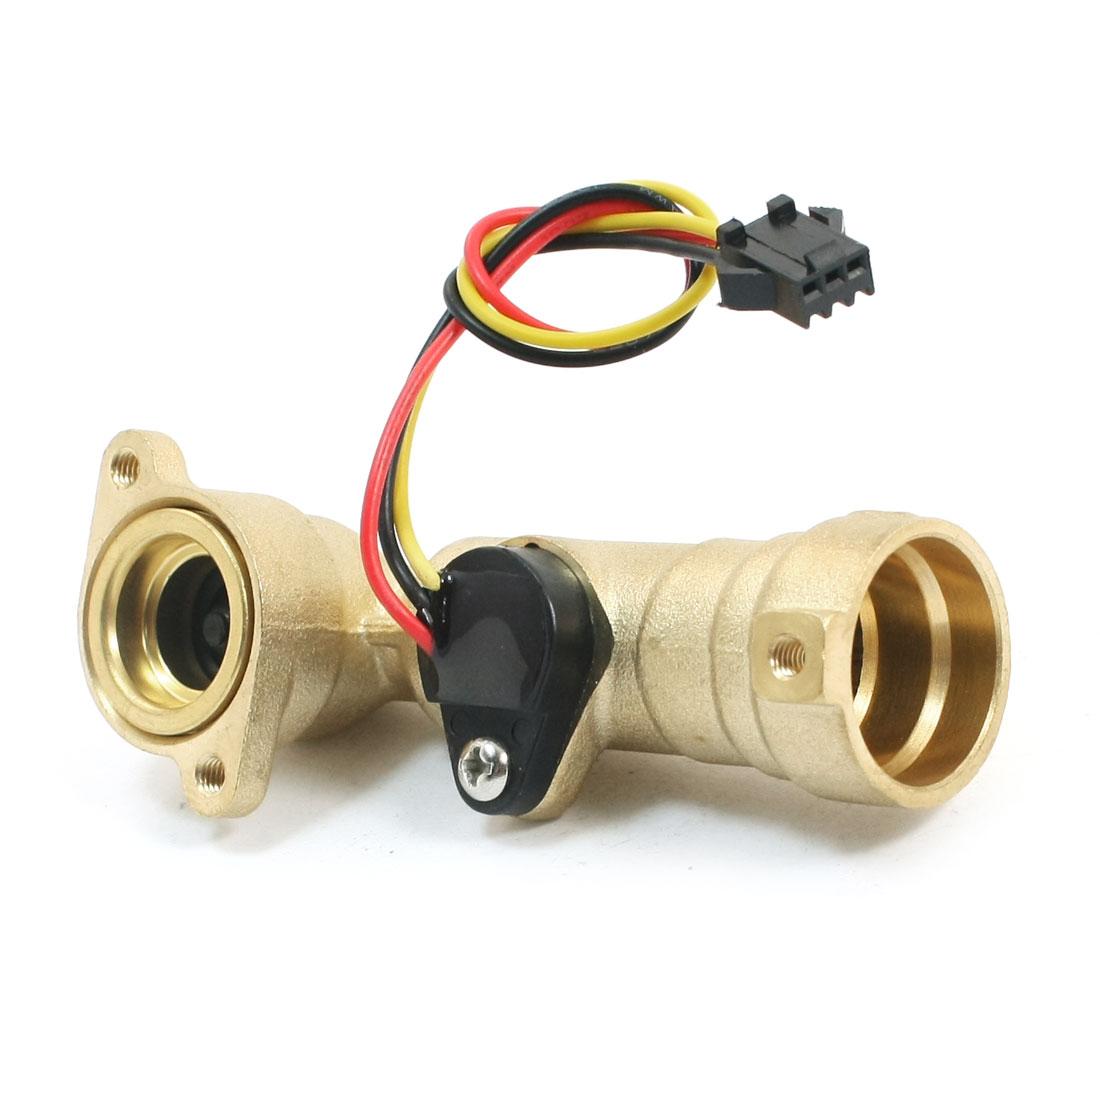 SEN-HW21RA G1/2 Inner Hole Dia 1-30L/min Hall Effect Water Flow Sensor Switch Flowmeter